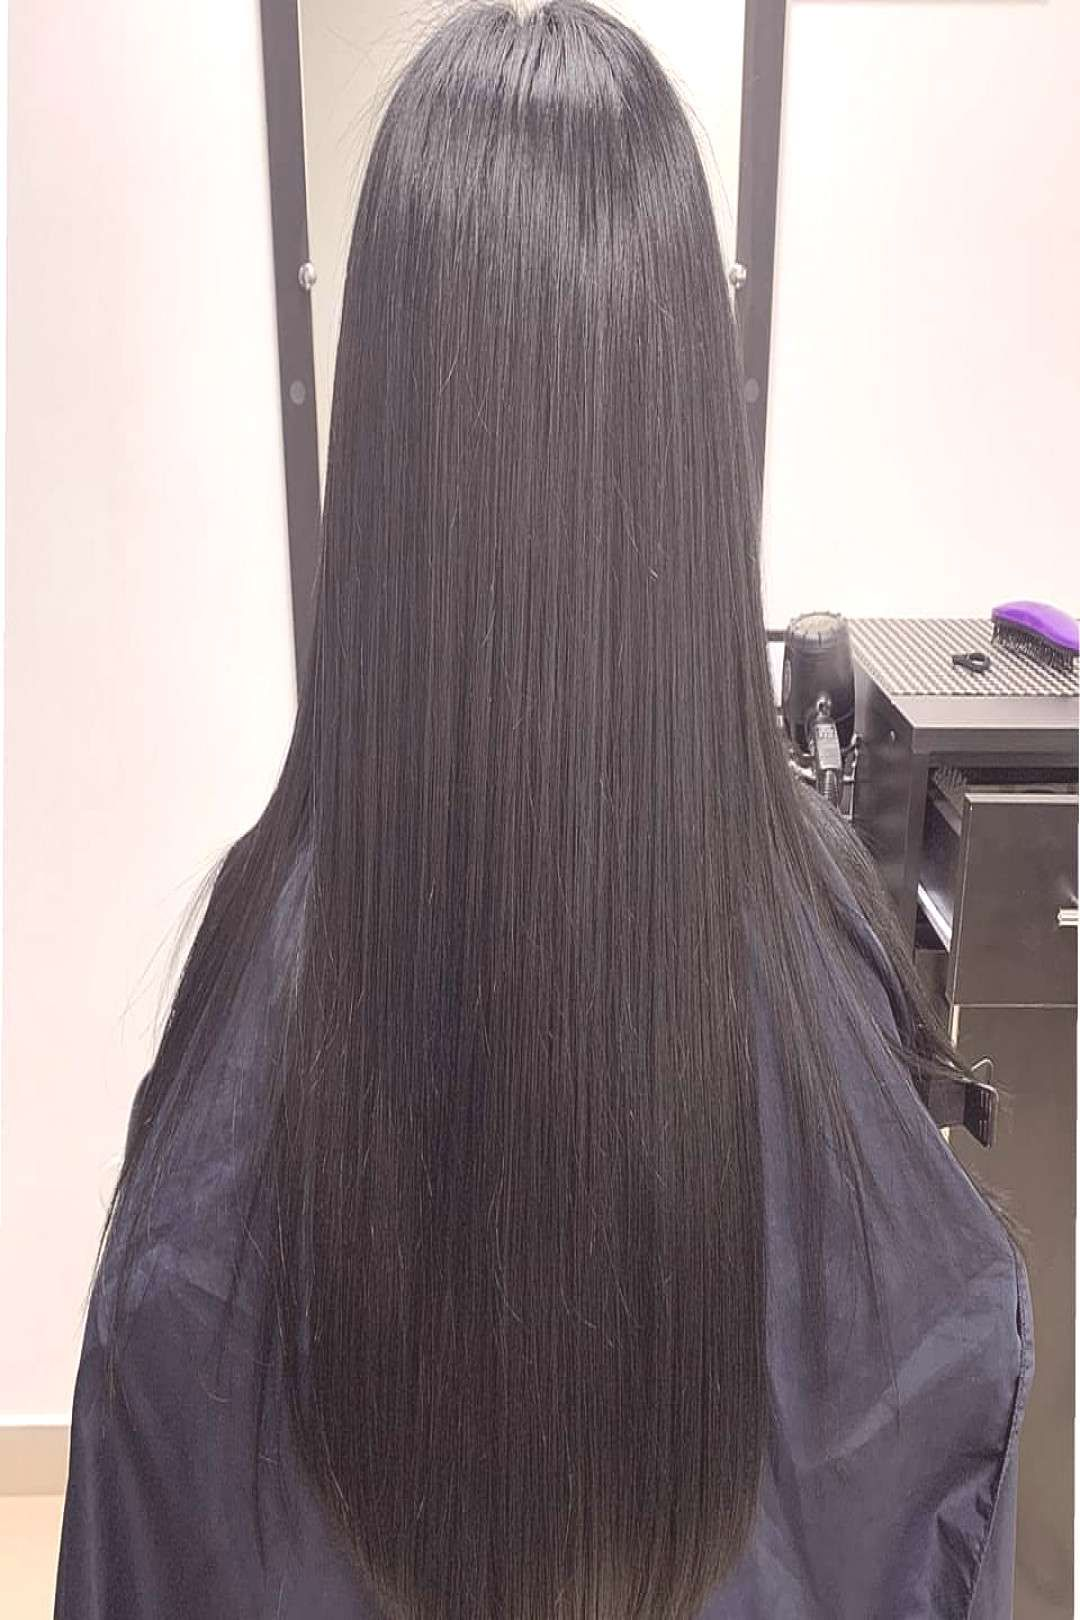 #0967418354 #opybhhr #kodkpcn #people #nicar #3nnc #more #tea #one #ao #ta #or #i #3 oаpбyBаHHR Ao i NicAR 3аNNc 3а TeA 0967418354 #kodkpаcN #taYou can find Beauty hair and more on our website.oаpбyBаHHR Ao i NicAR 3аNNc 3а TeA 0...